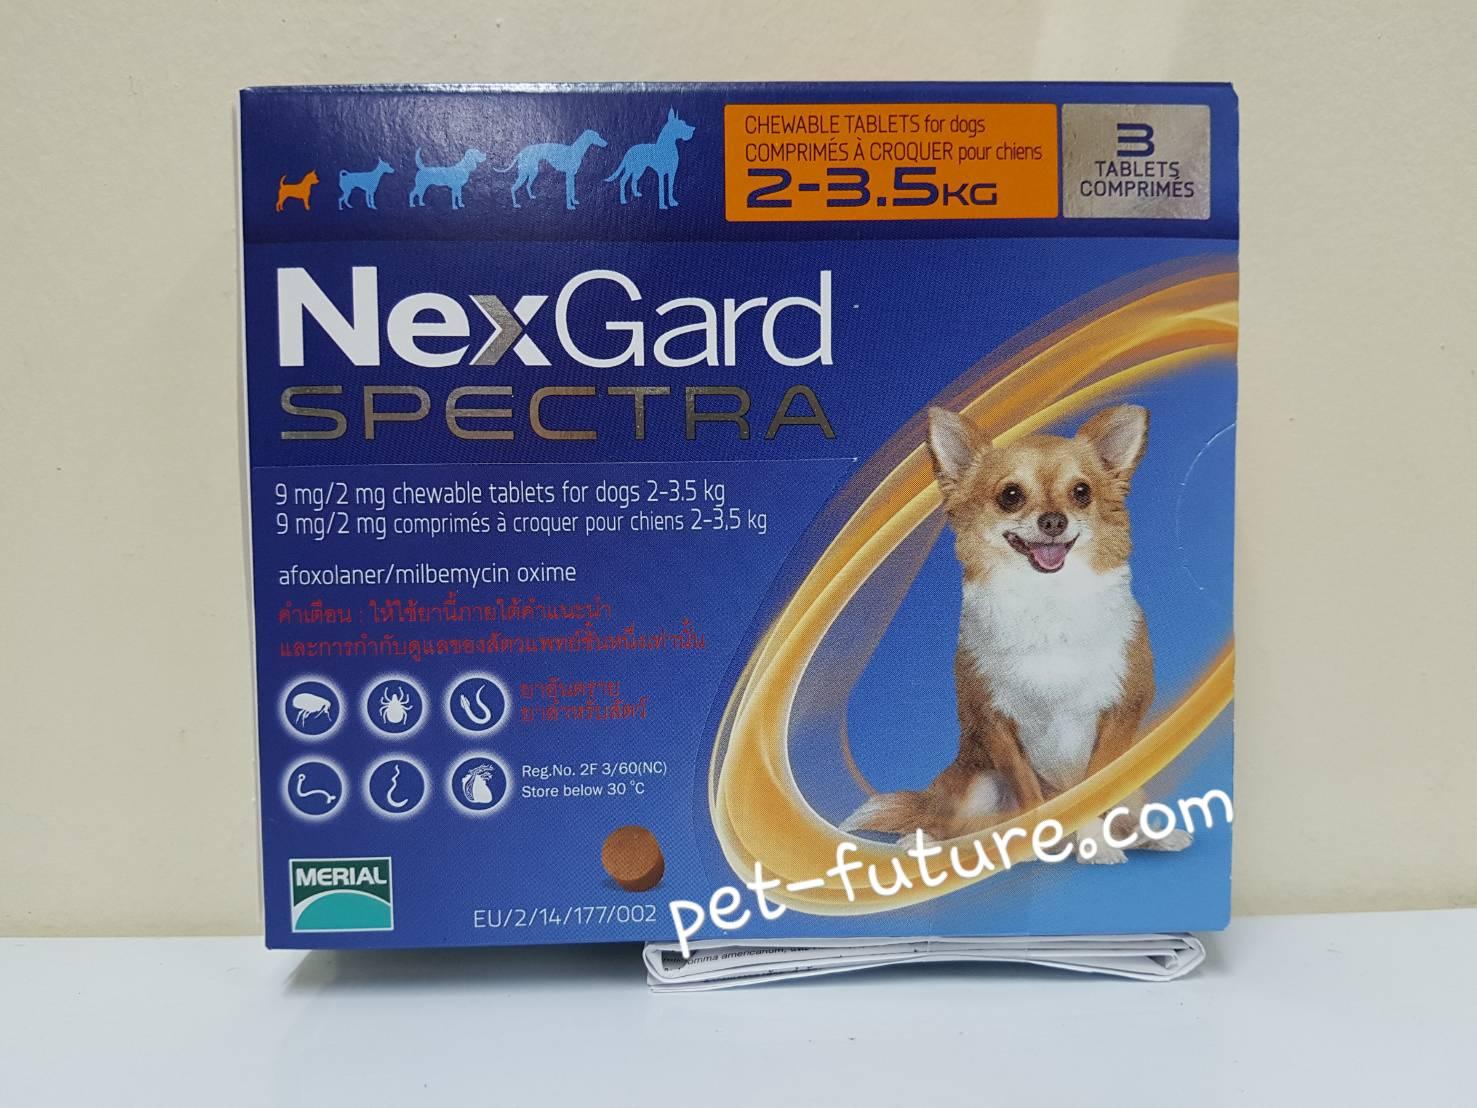 NexGard Spactra 2-3.5 kg. Exp.02/19 ป้องกันเห็บ หมัด พยาธิหนอนหัวใจ พยาธิทางเดินอาหาร